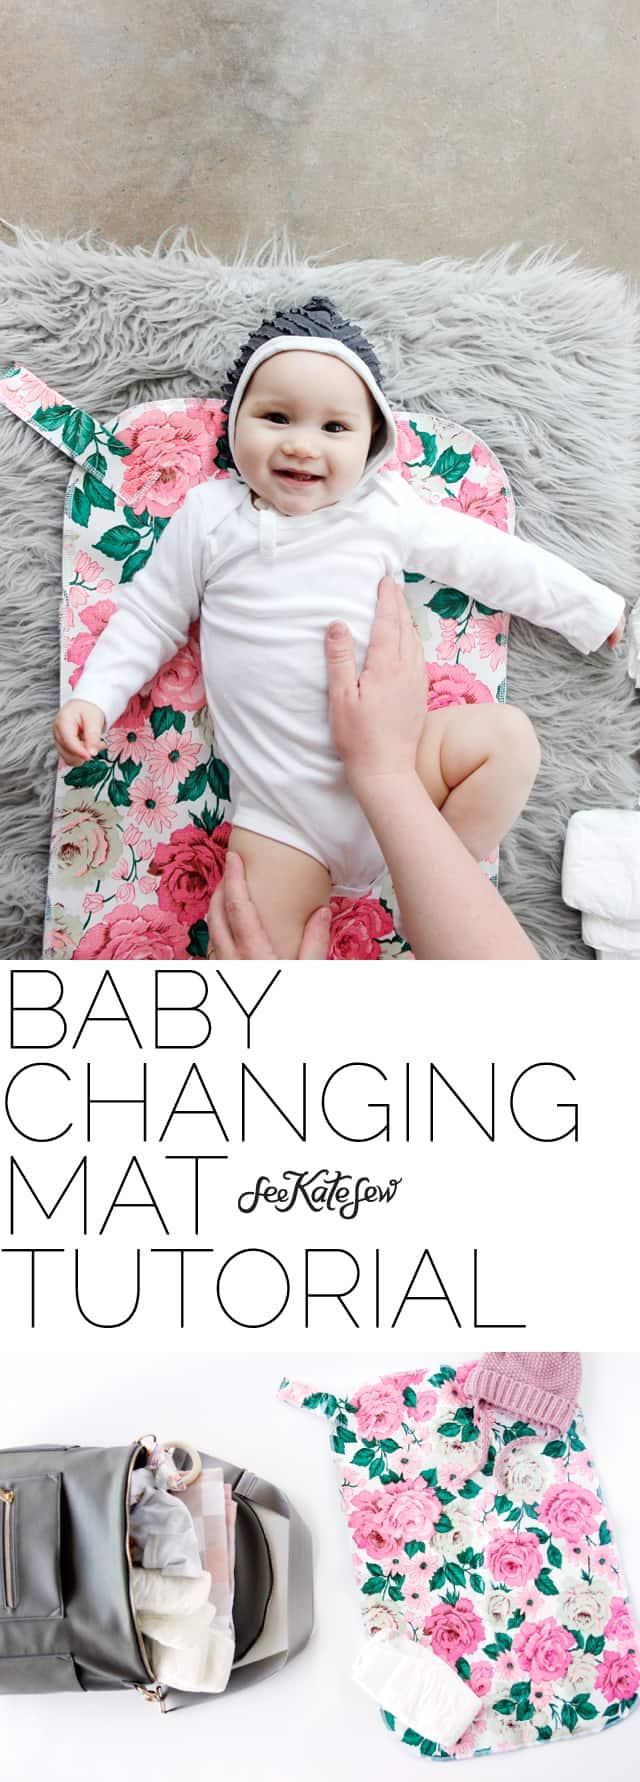 DIY Baby Changing Mat Tutorial | handmade baby changing mat | diy baby accessories | baby changing mat pattern | sewing tutorials | free sewing patterns || See Kate Sew #babychangingmat #diybaby #babyaccessories